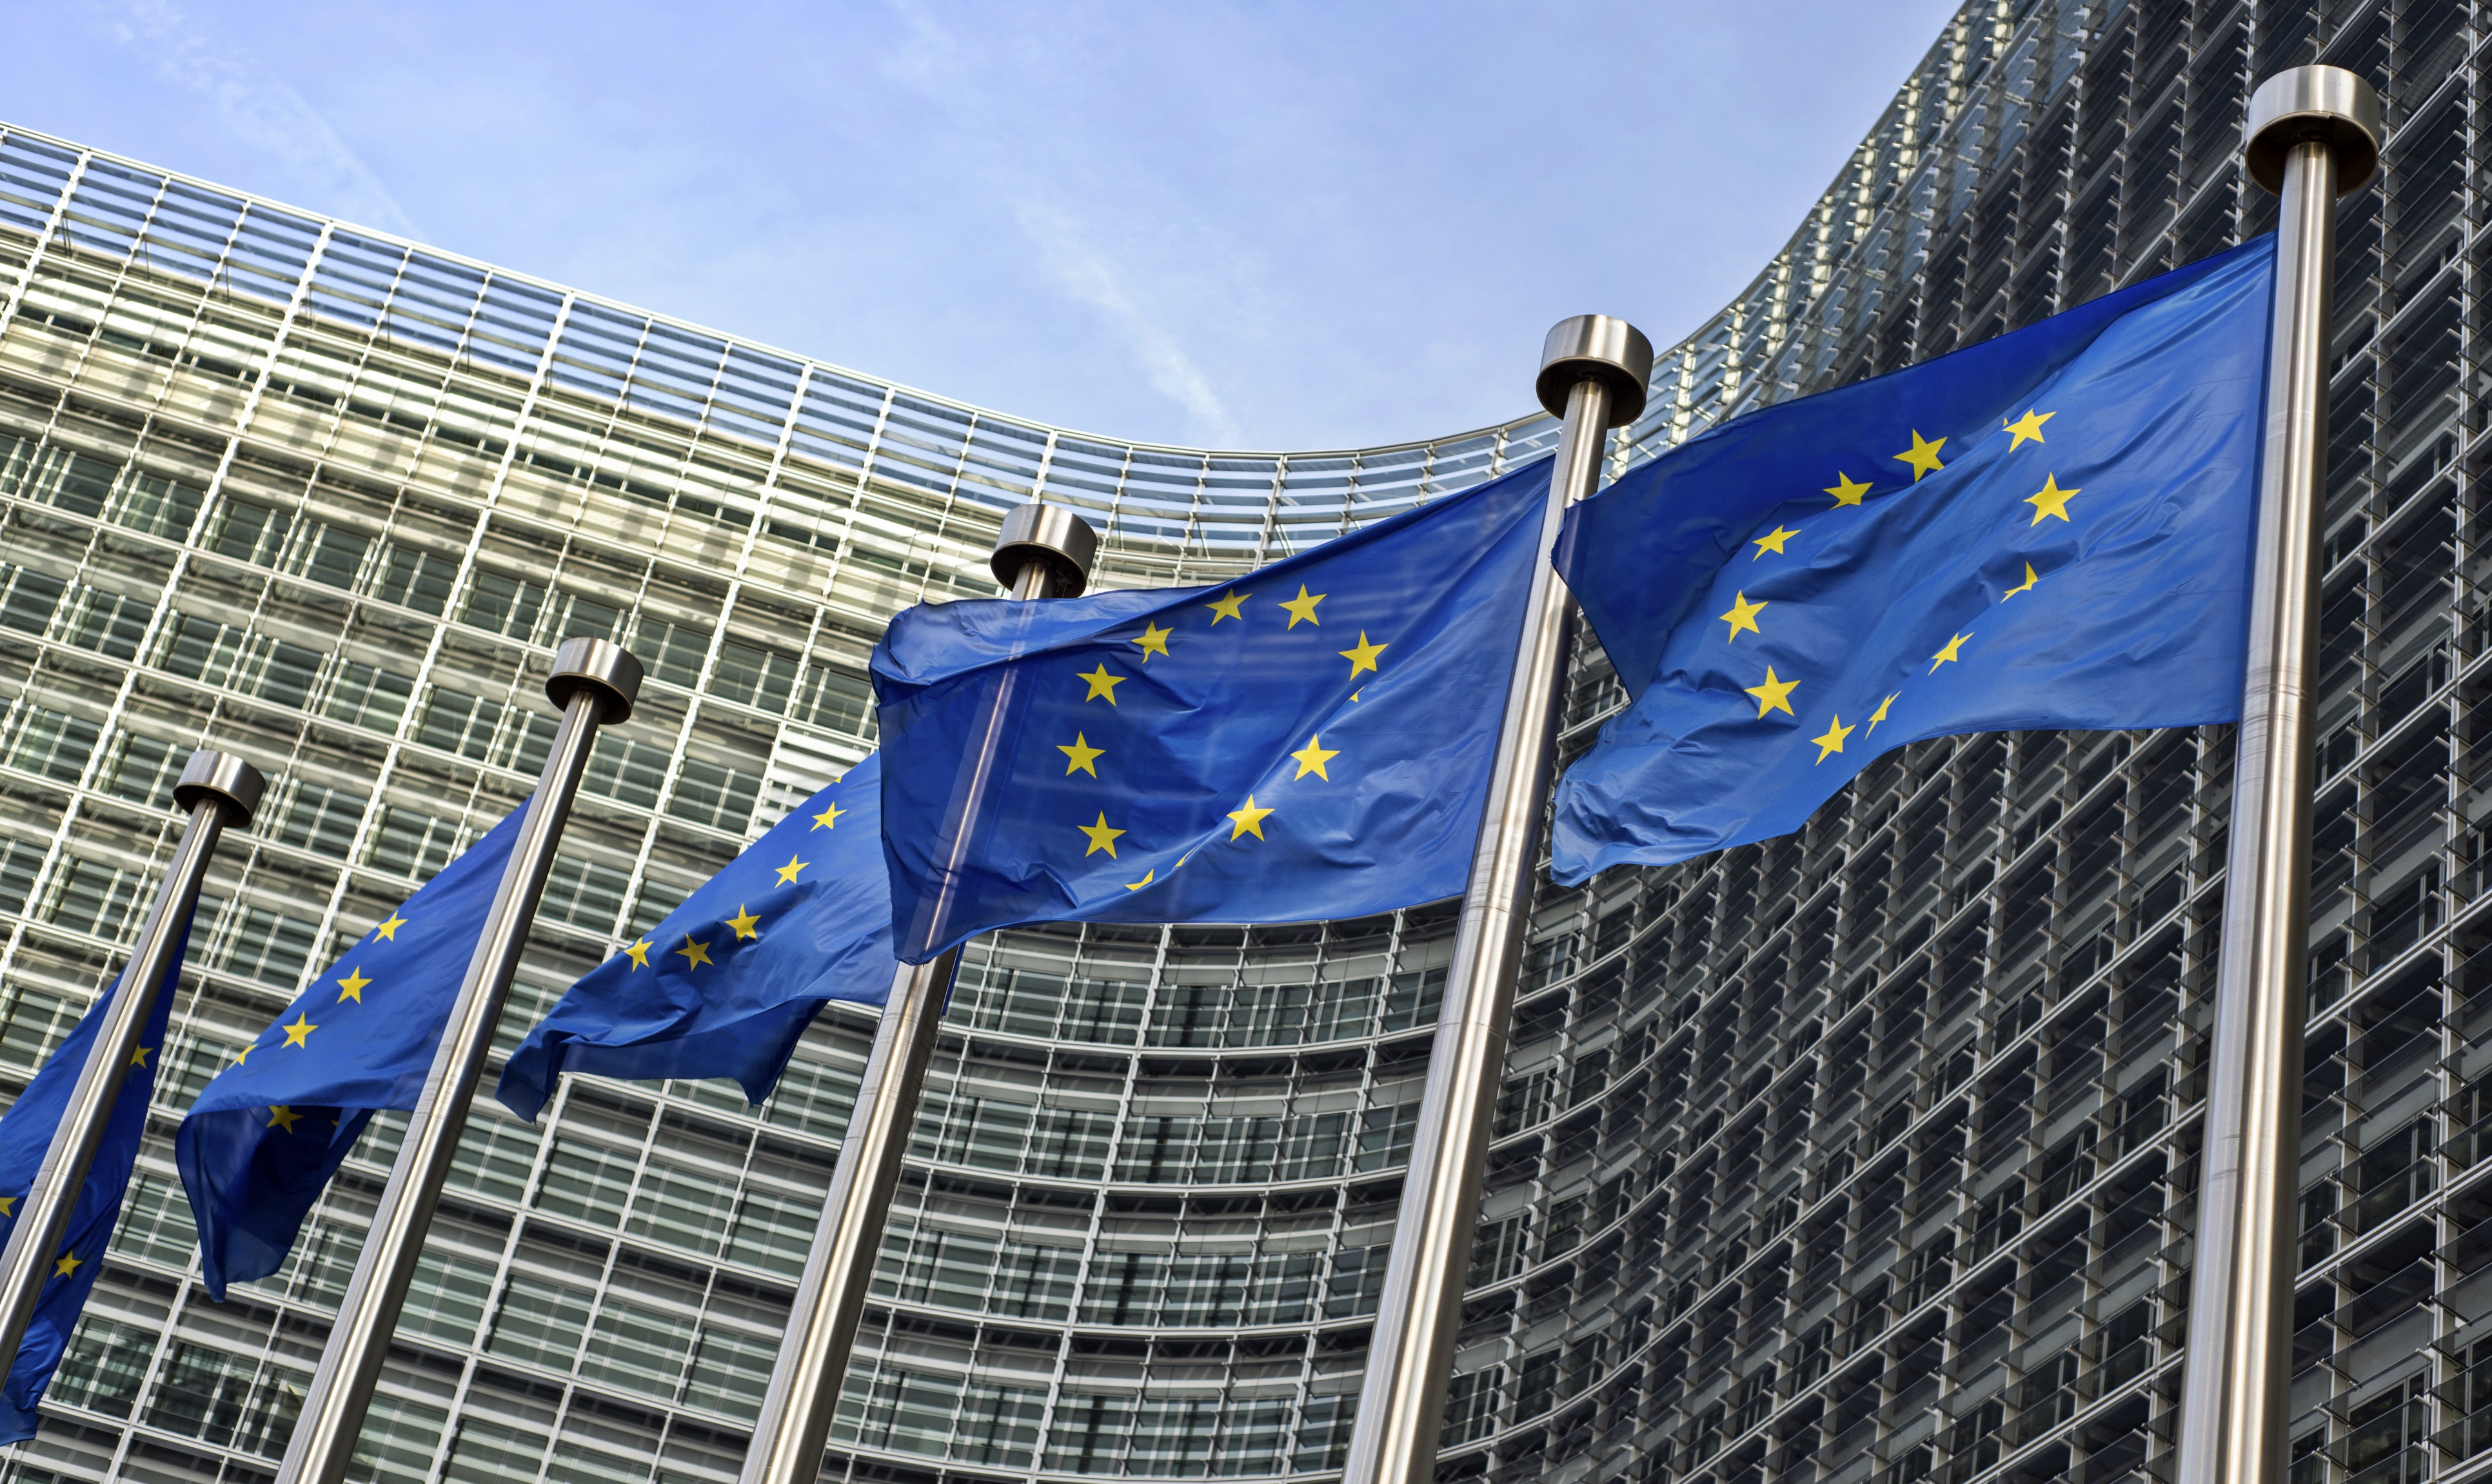 Commissione Ue vara riforma per completare Unione monetaria